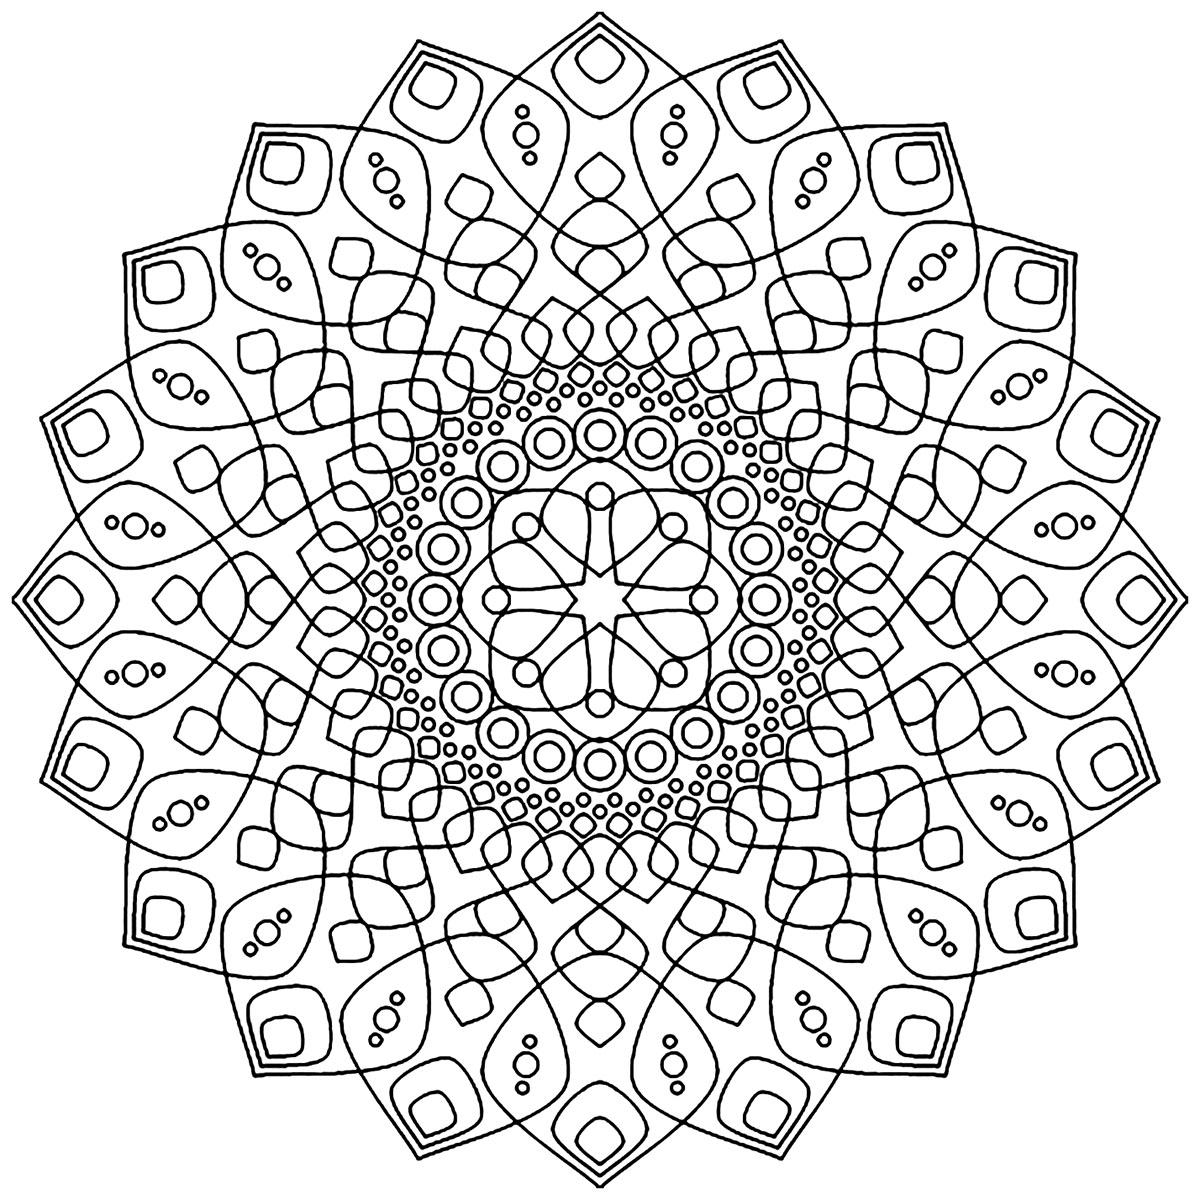 Mandala Apaisant Et Destressant Mandalas De Difficulte Normale 100 Mandalas Zen Anti Stress